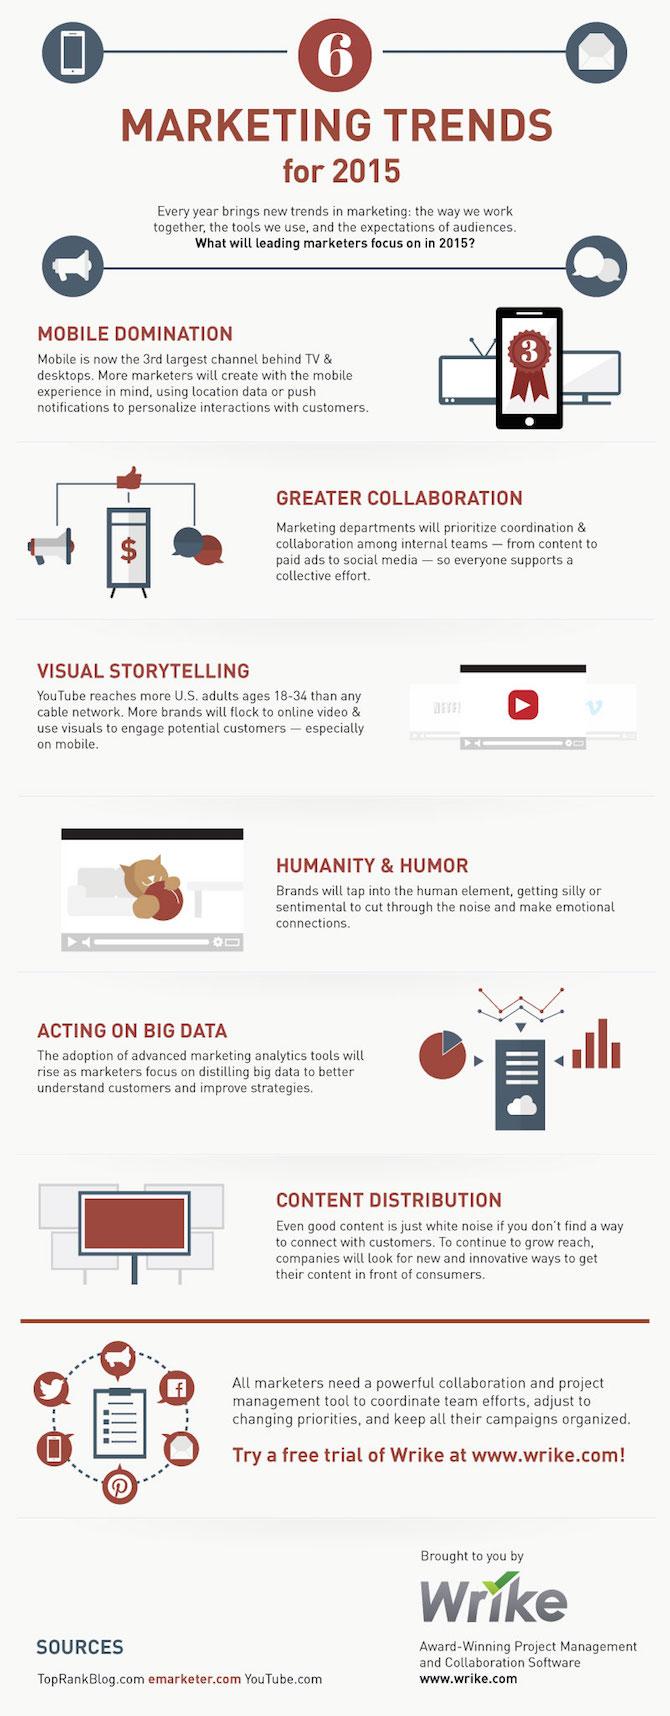 2015 Marketing Trends